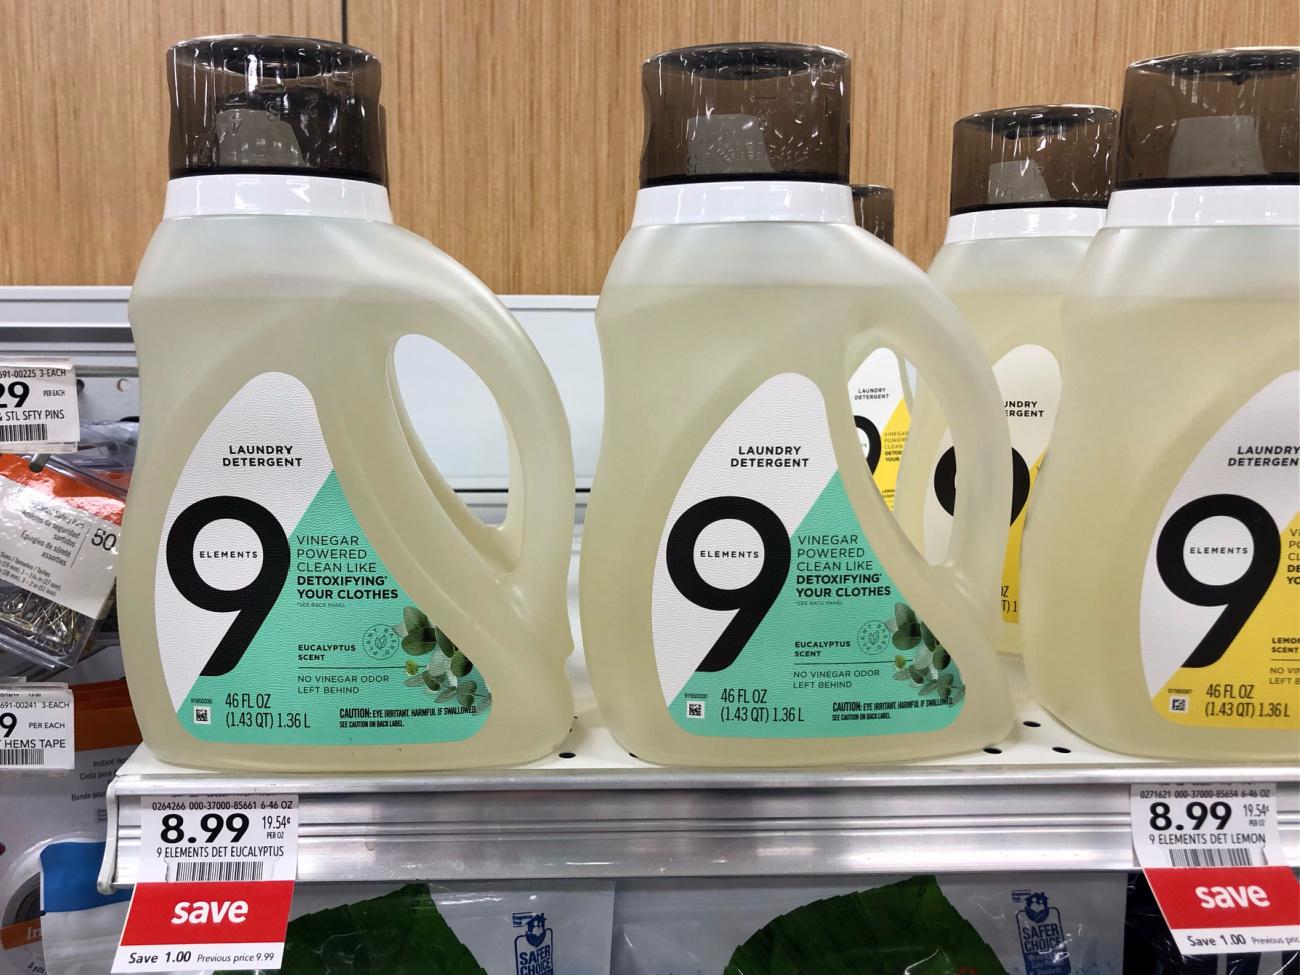 9 Elements Laundry Detergent Just $5.99 (Regular Price $9.99) on I Heart Publix